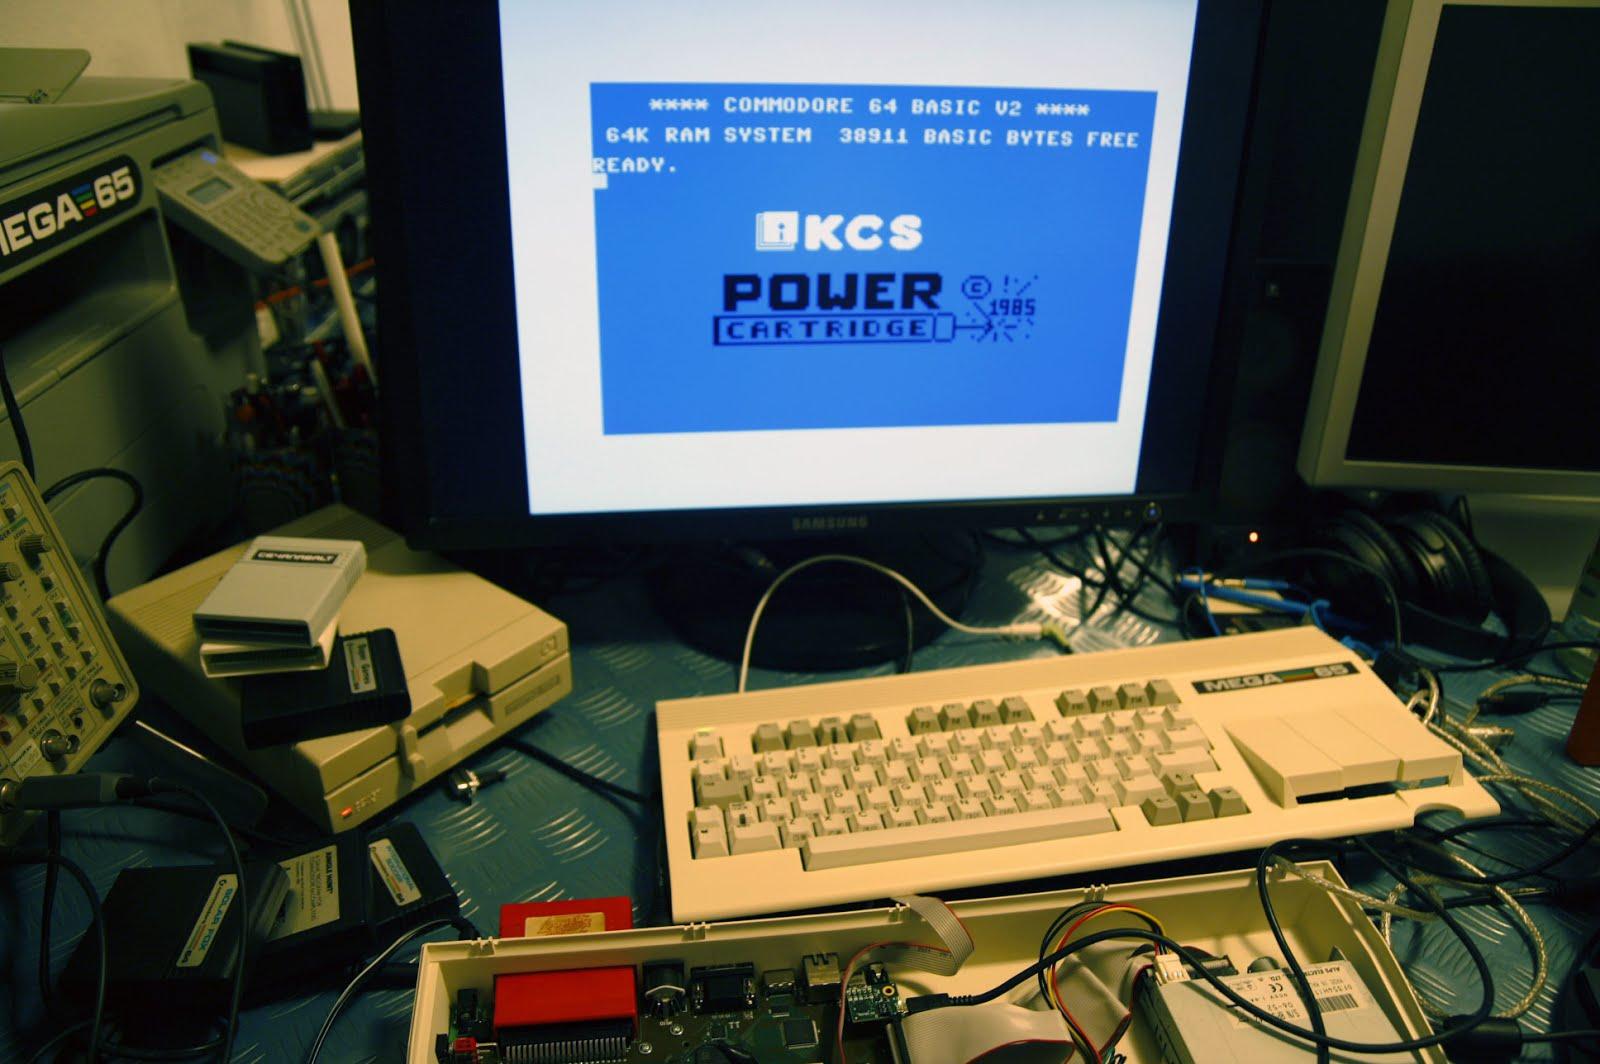 Making a C64/C65 compatible computer